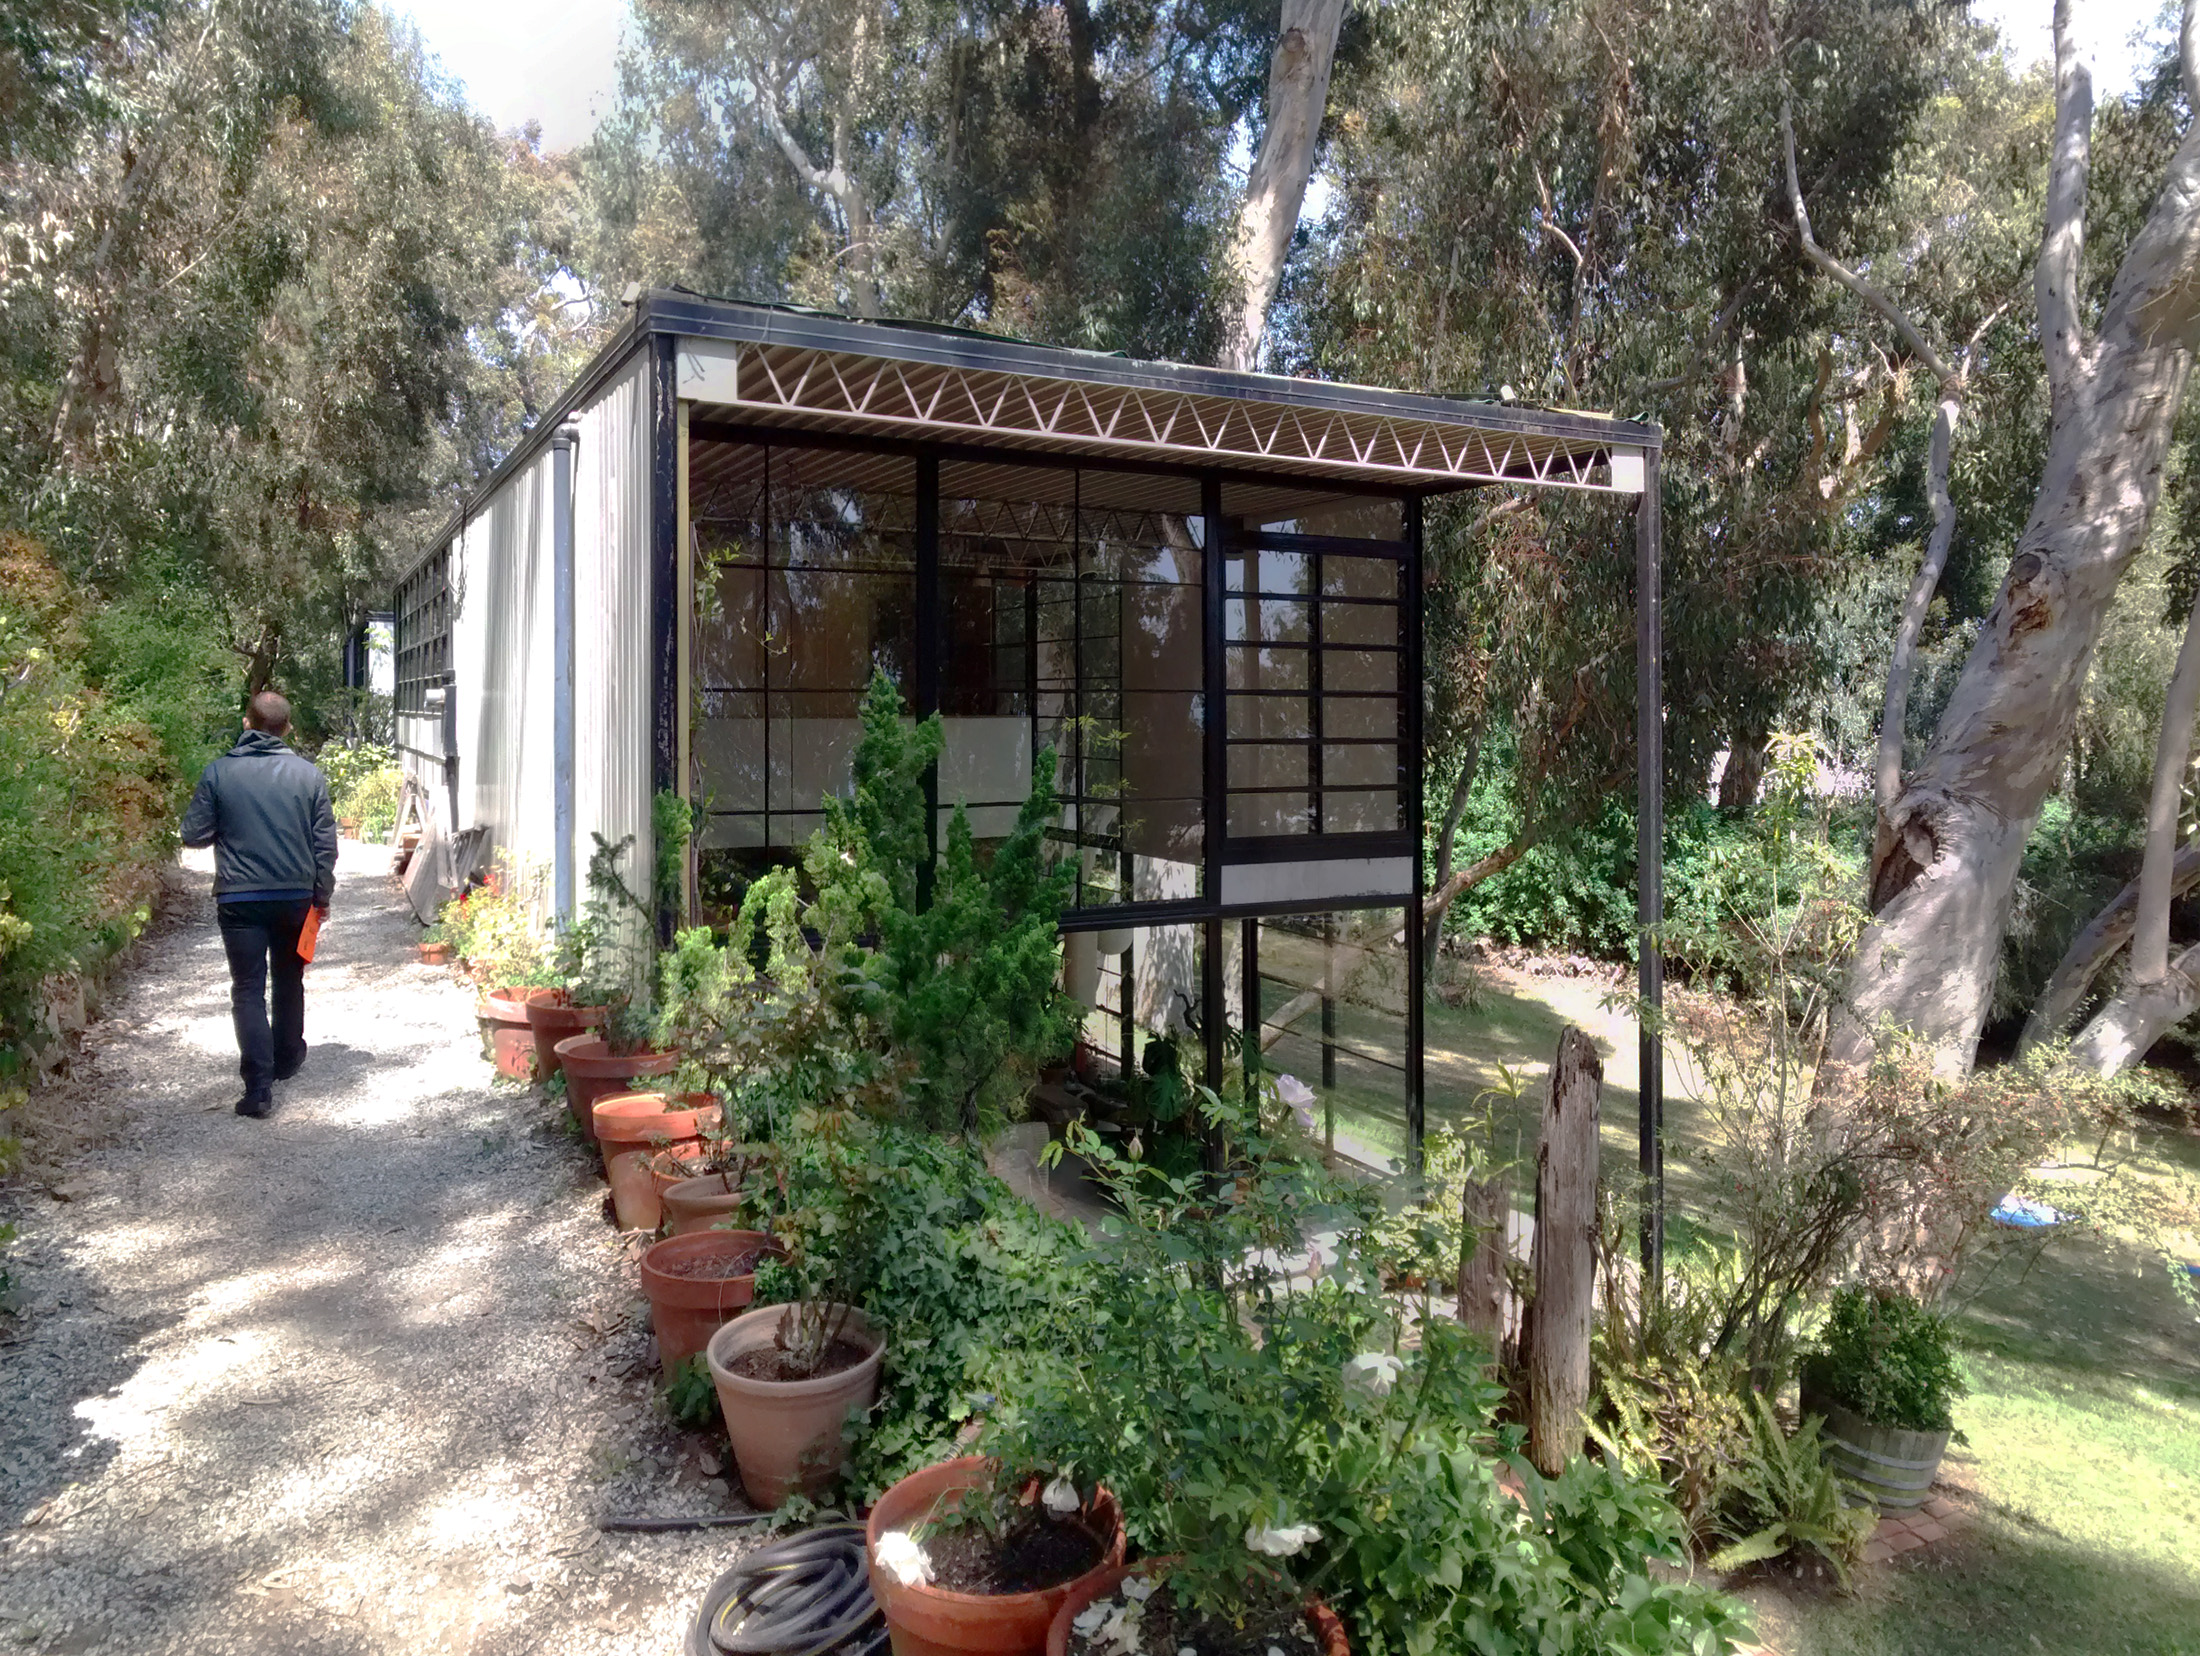 Eames house as a modern kit house